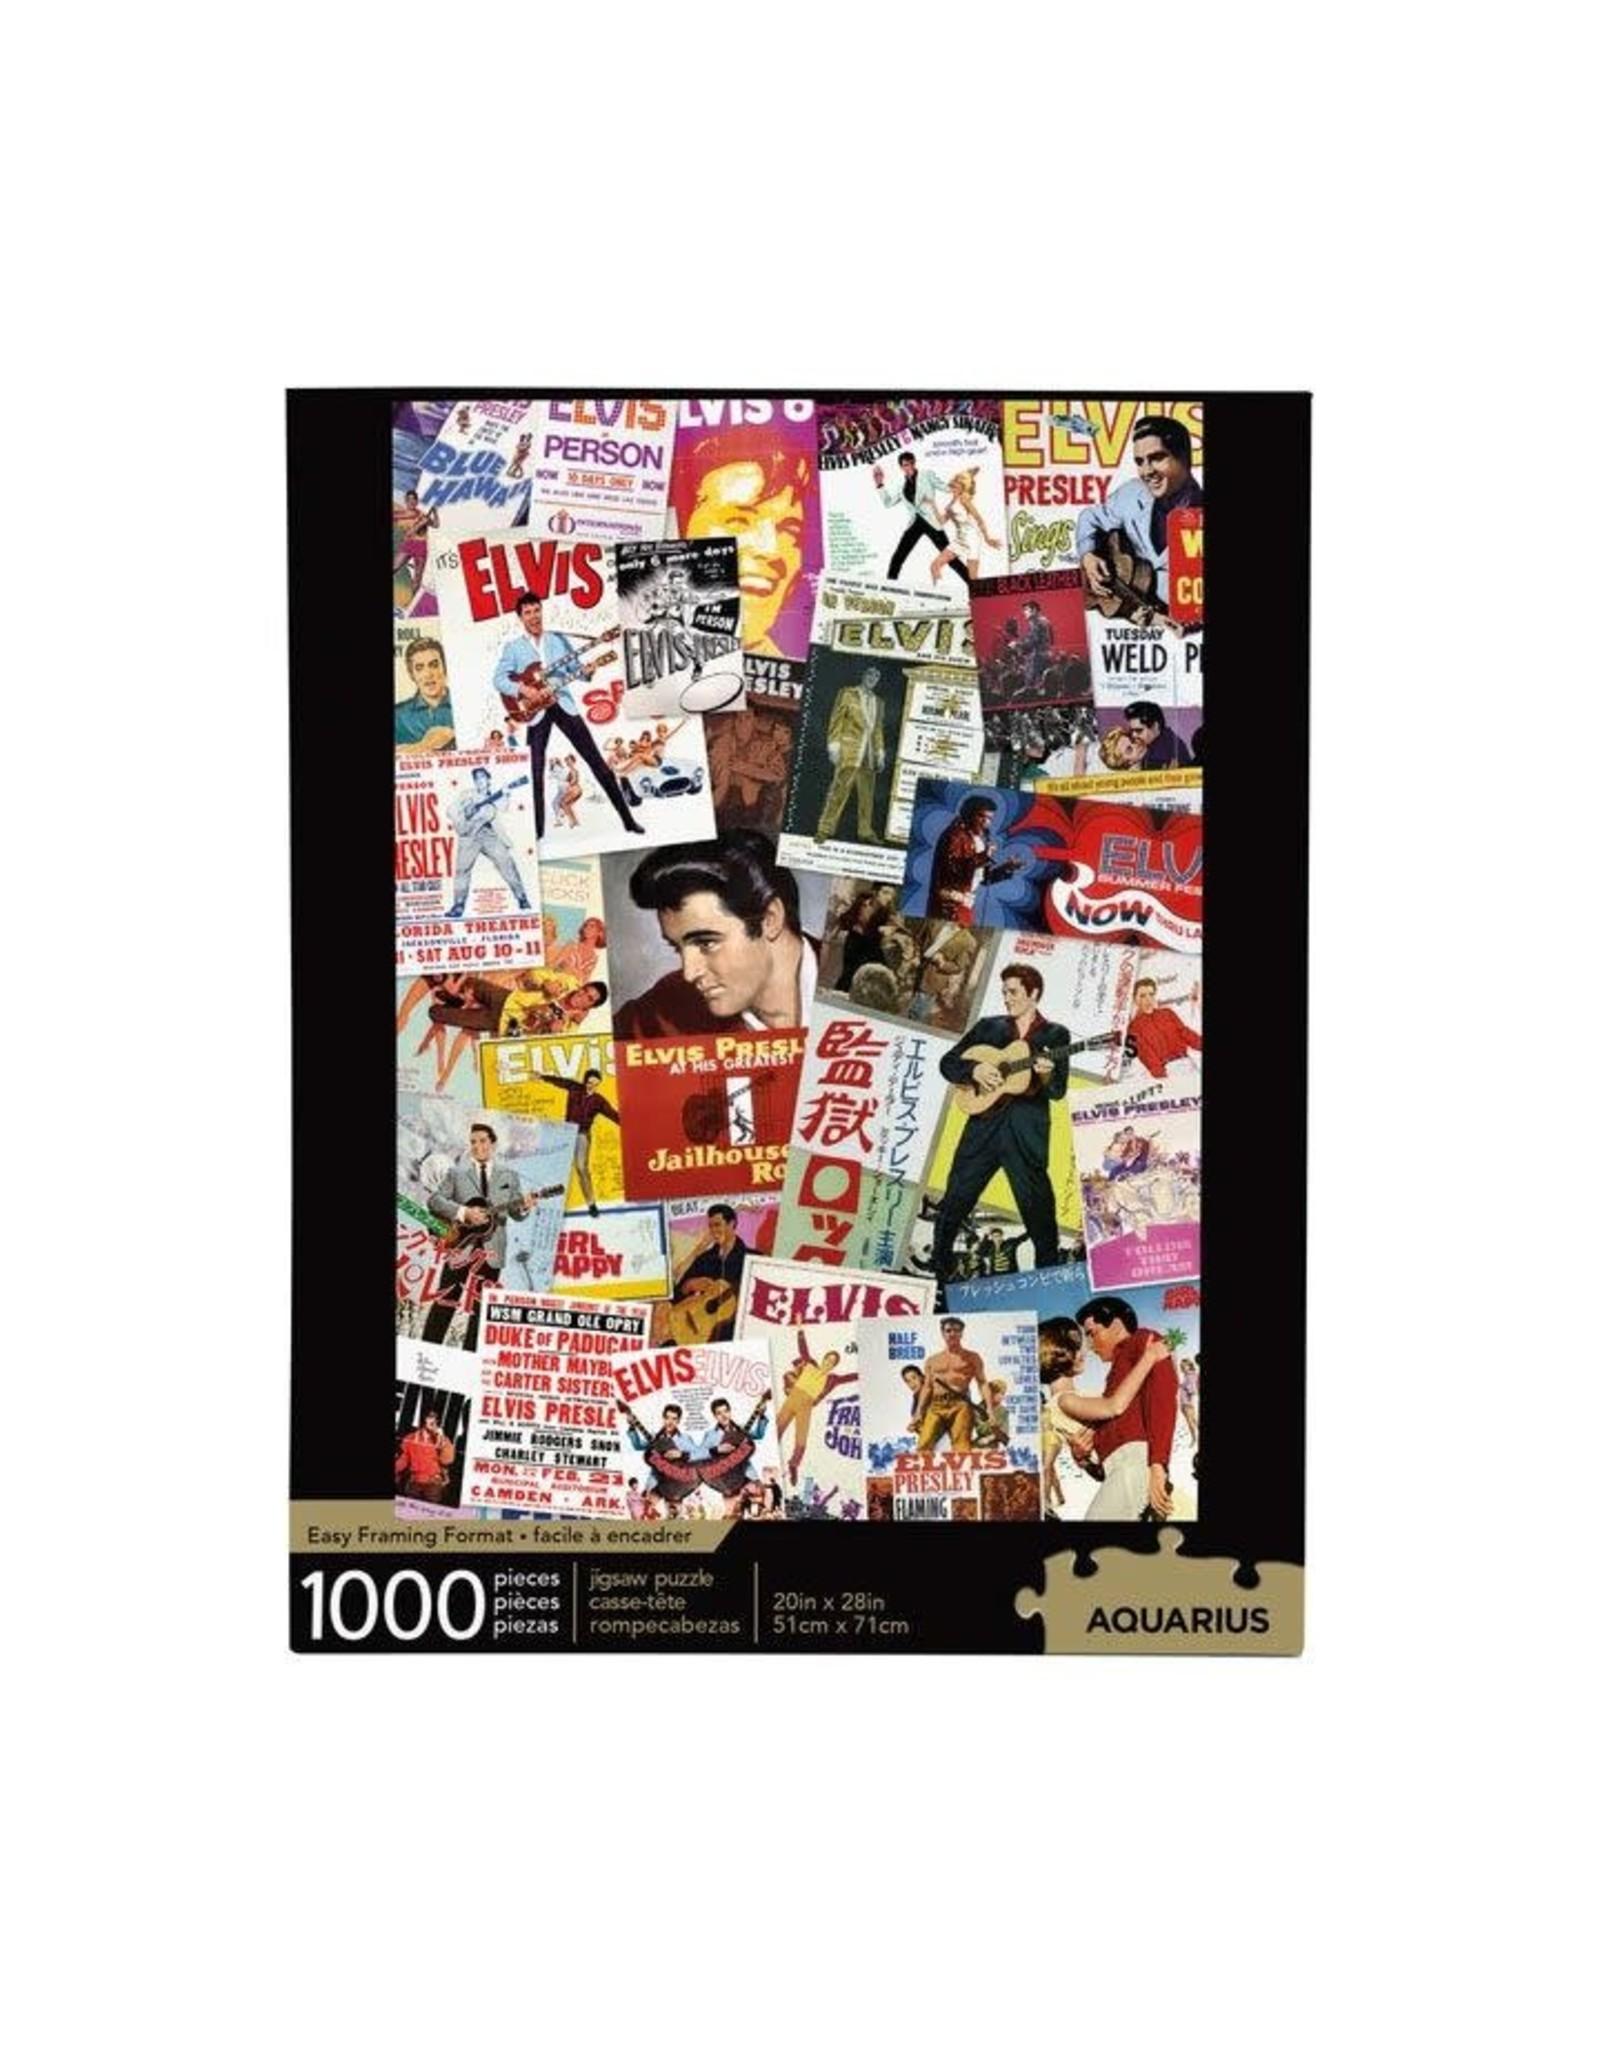 Aquarius Ent ELVIS PRESLEY Puzzle 1000P - Movie Poster Collage